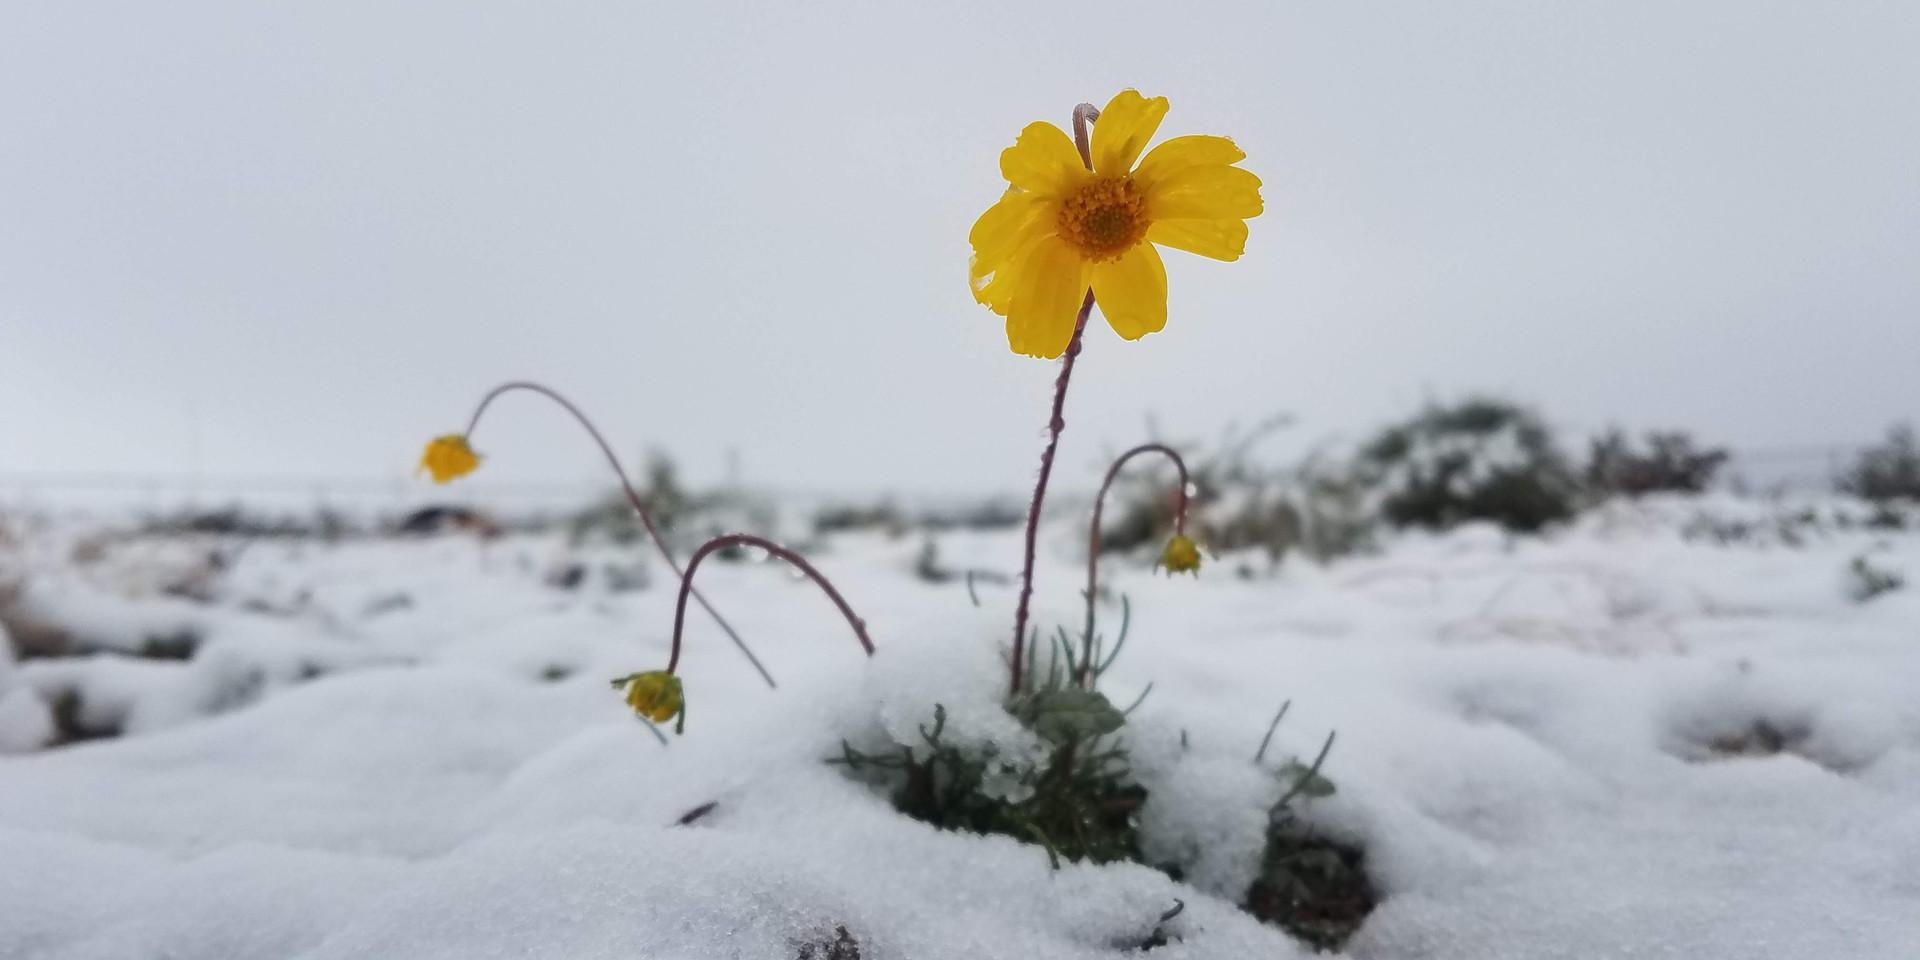 Snow day 29 Palms, CA